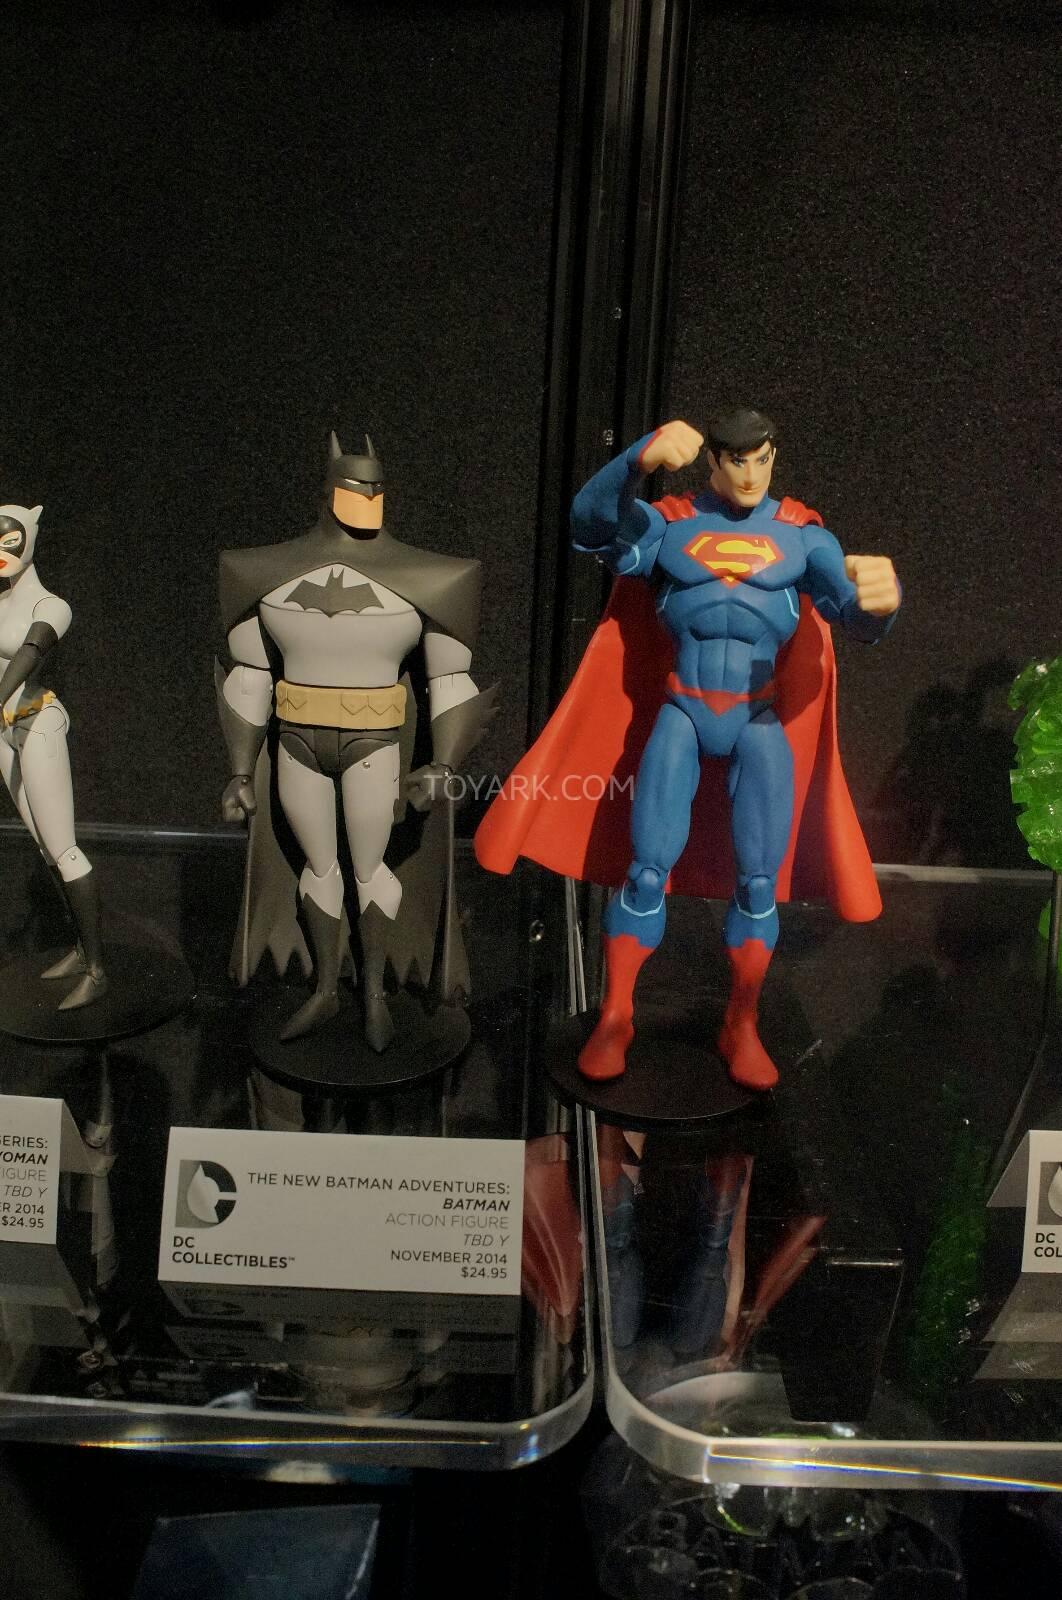 [Toy Fair 2014] DC Collectibles Toy-Fair-2014-DC-Collectibles-150